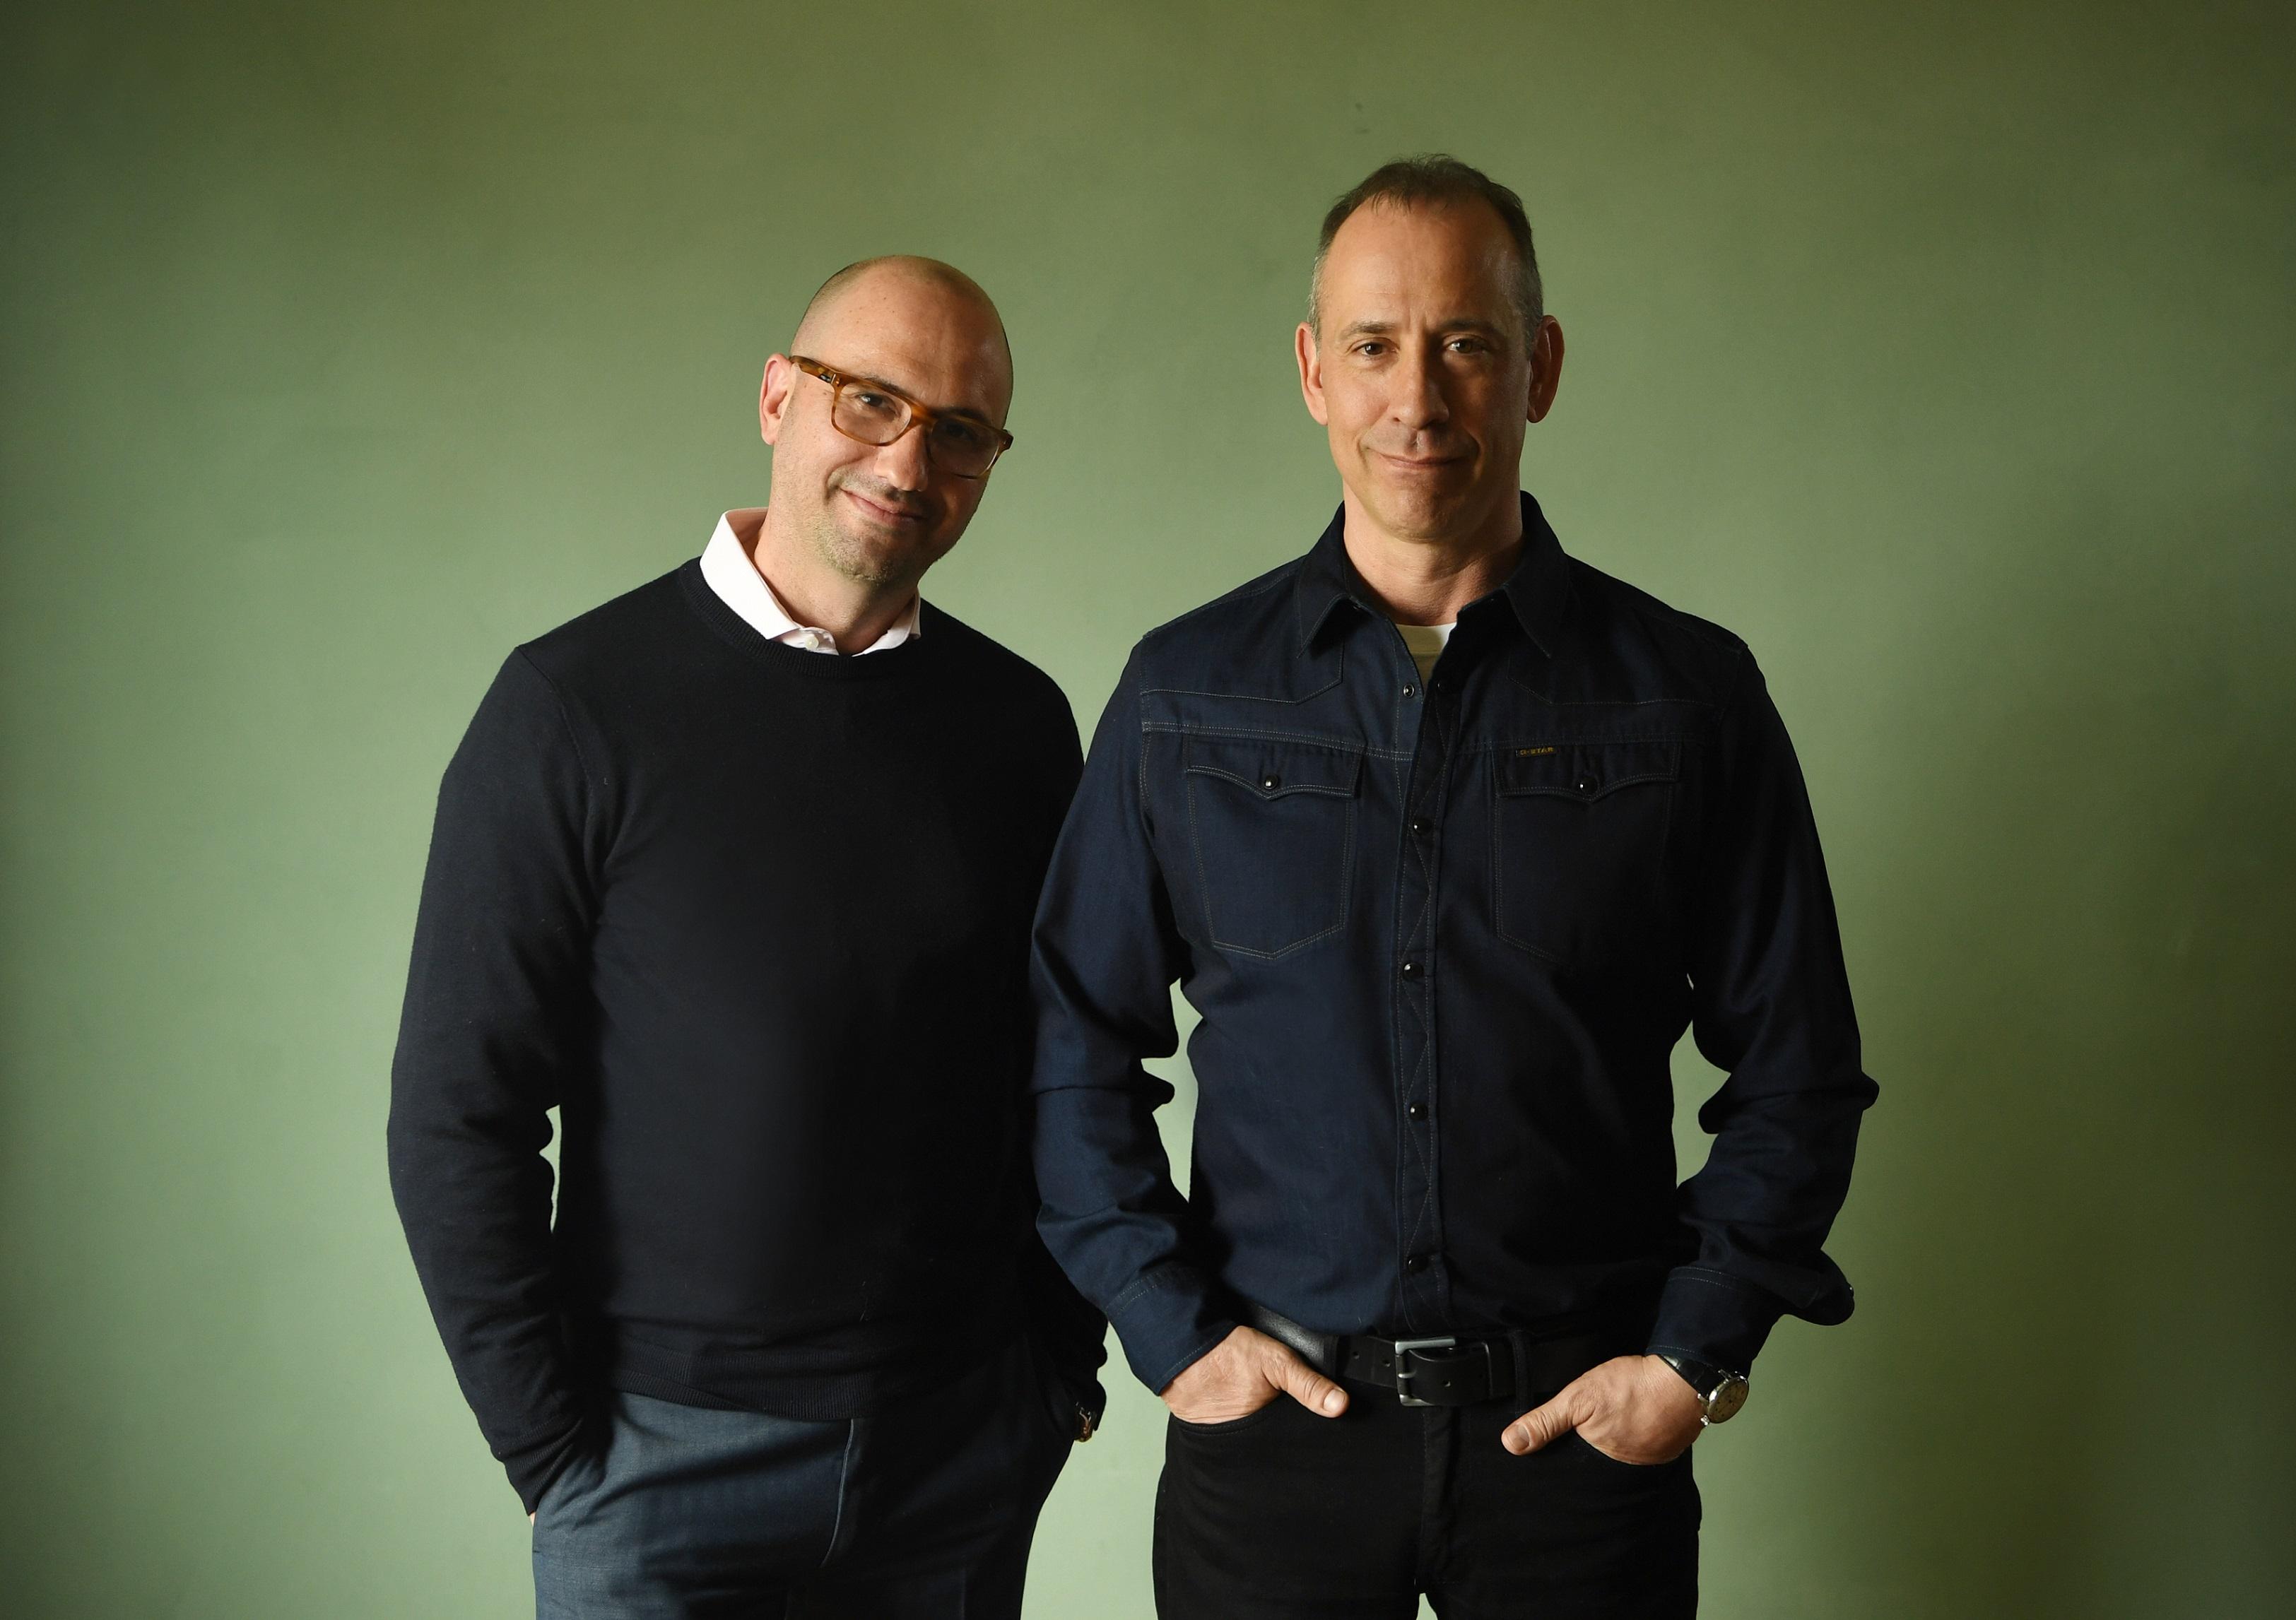 David and Michael Morton